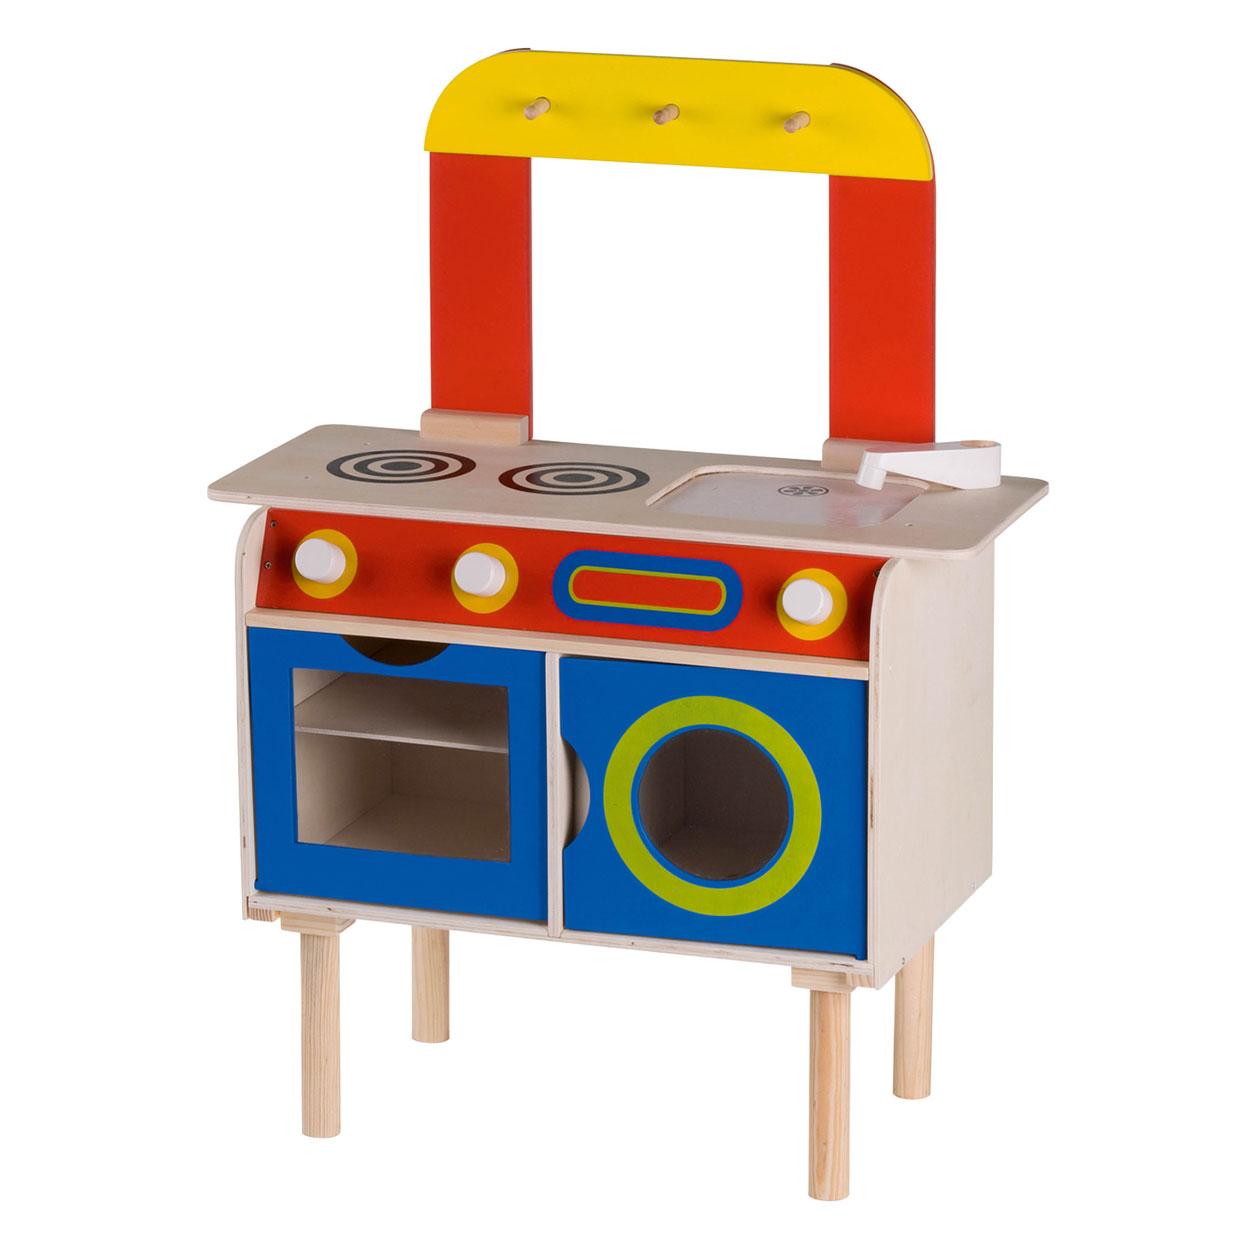 Houten Keuken Speelgoed : Houten Keuken online kopen Lobbes.nl